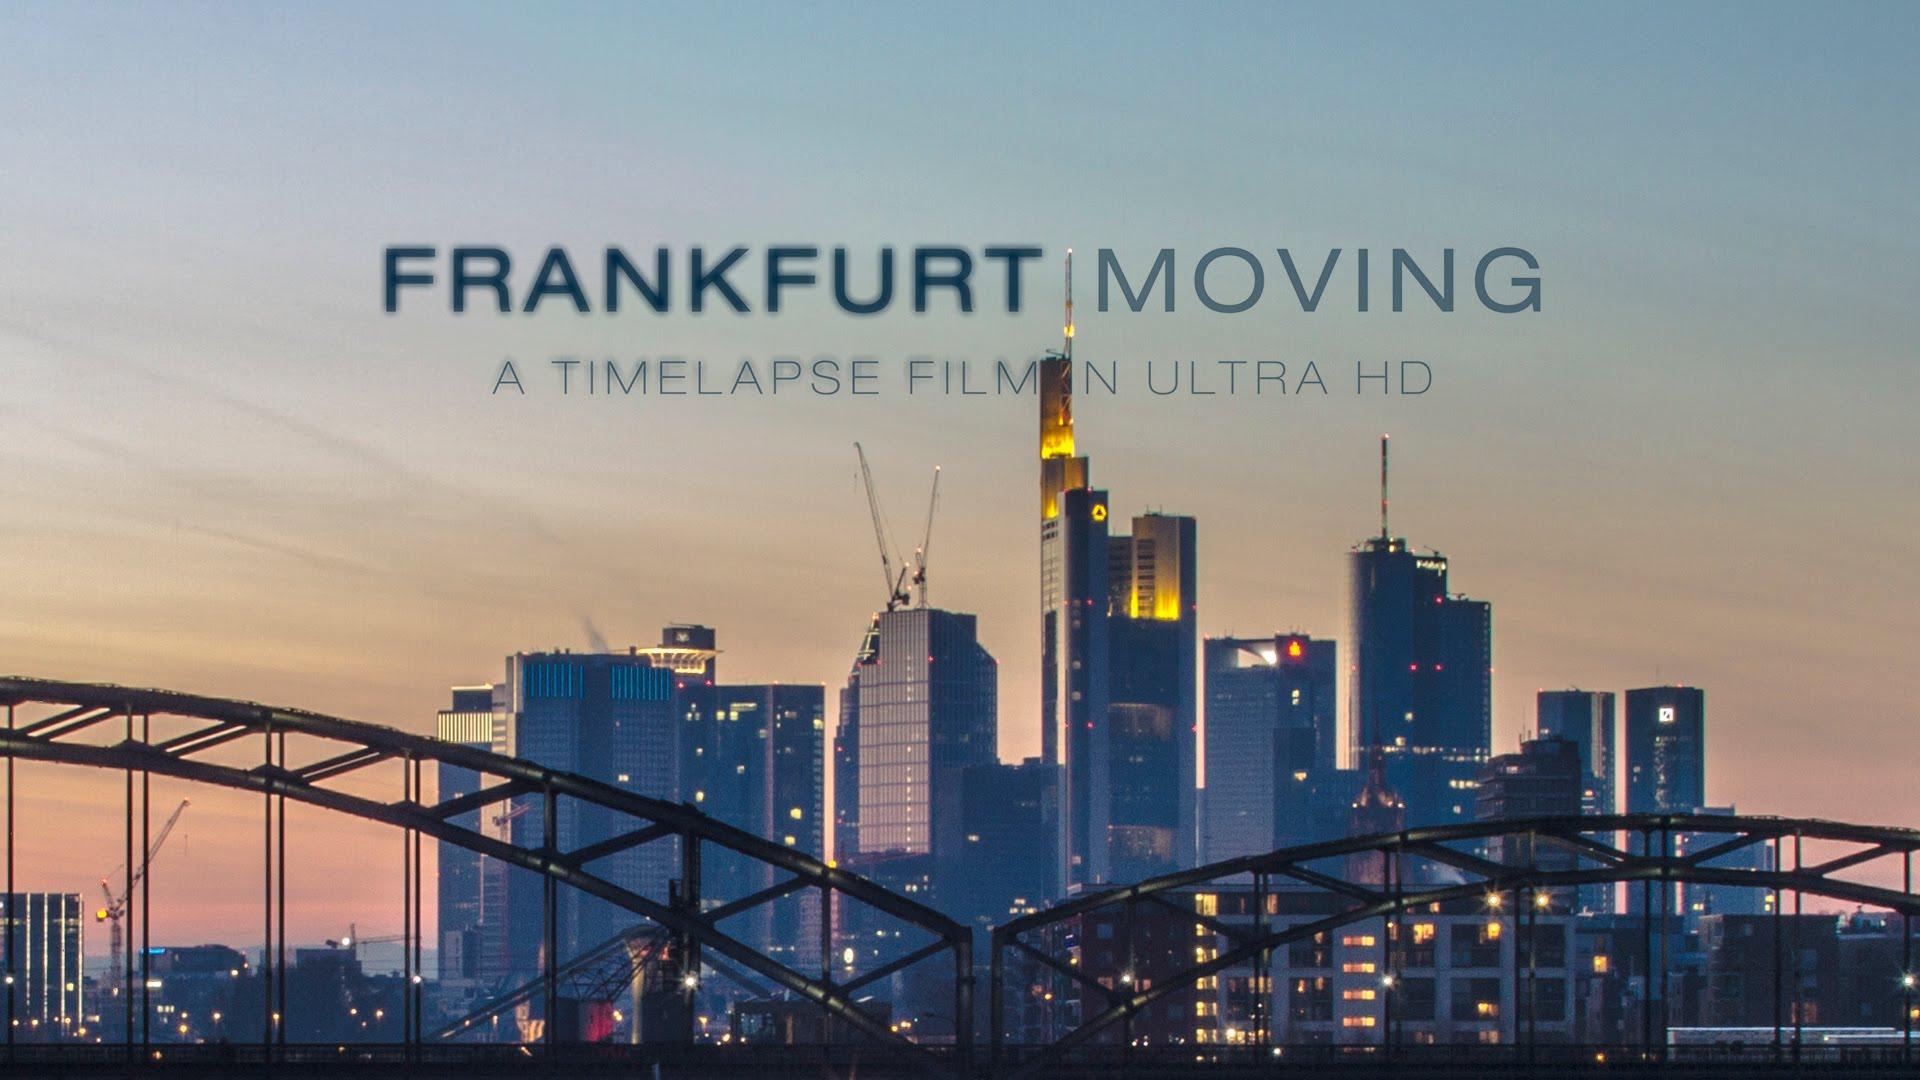 Timelapse: Frankfurt Moving | Travel | Was is hier eigentlich los?